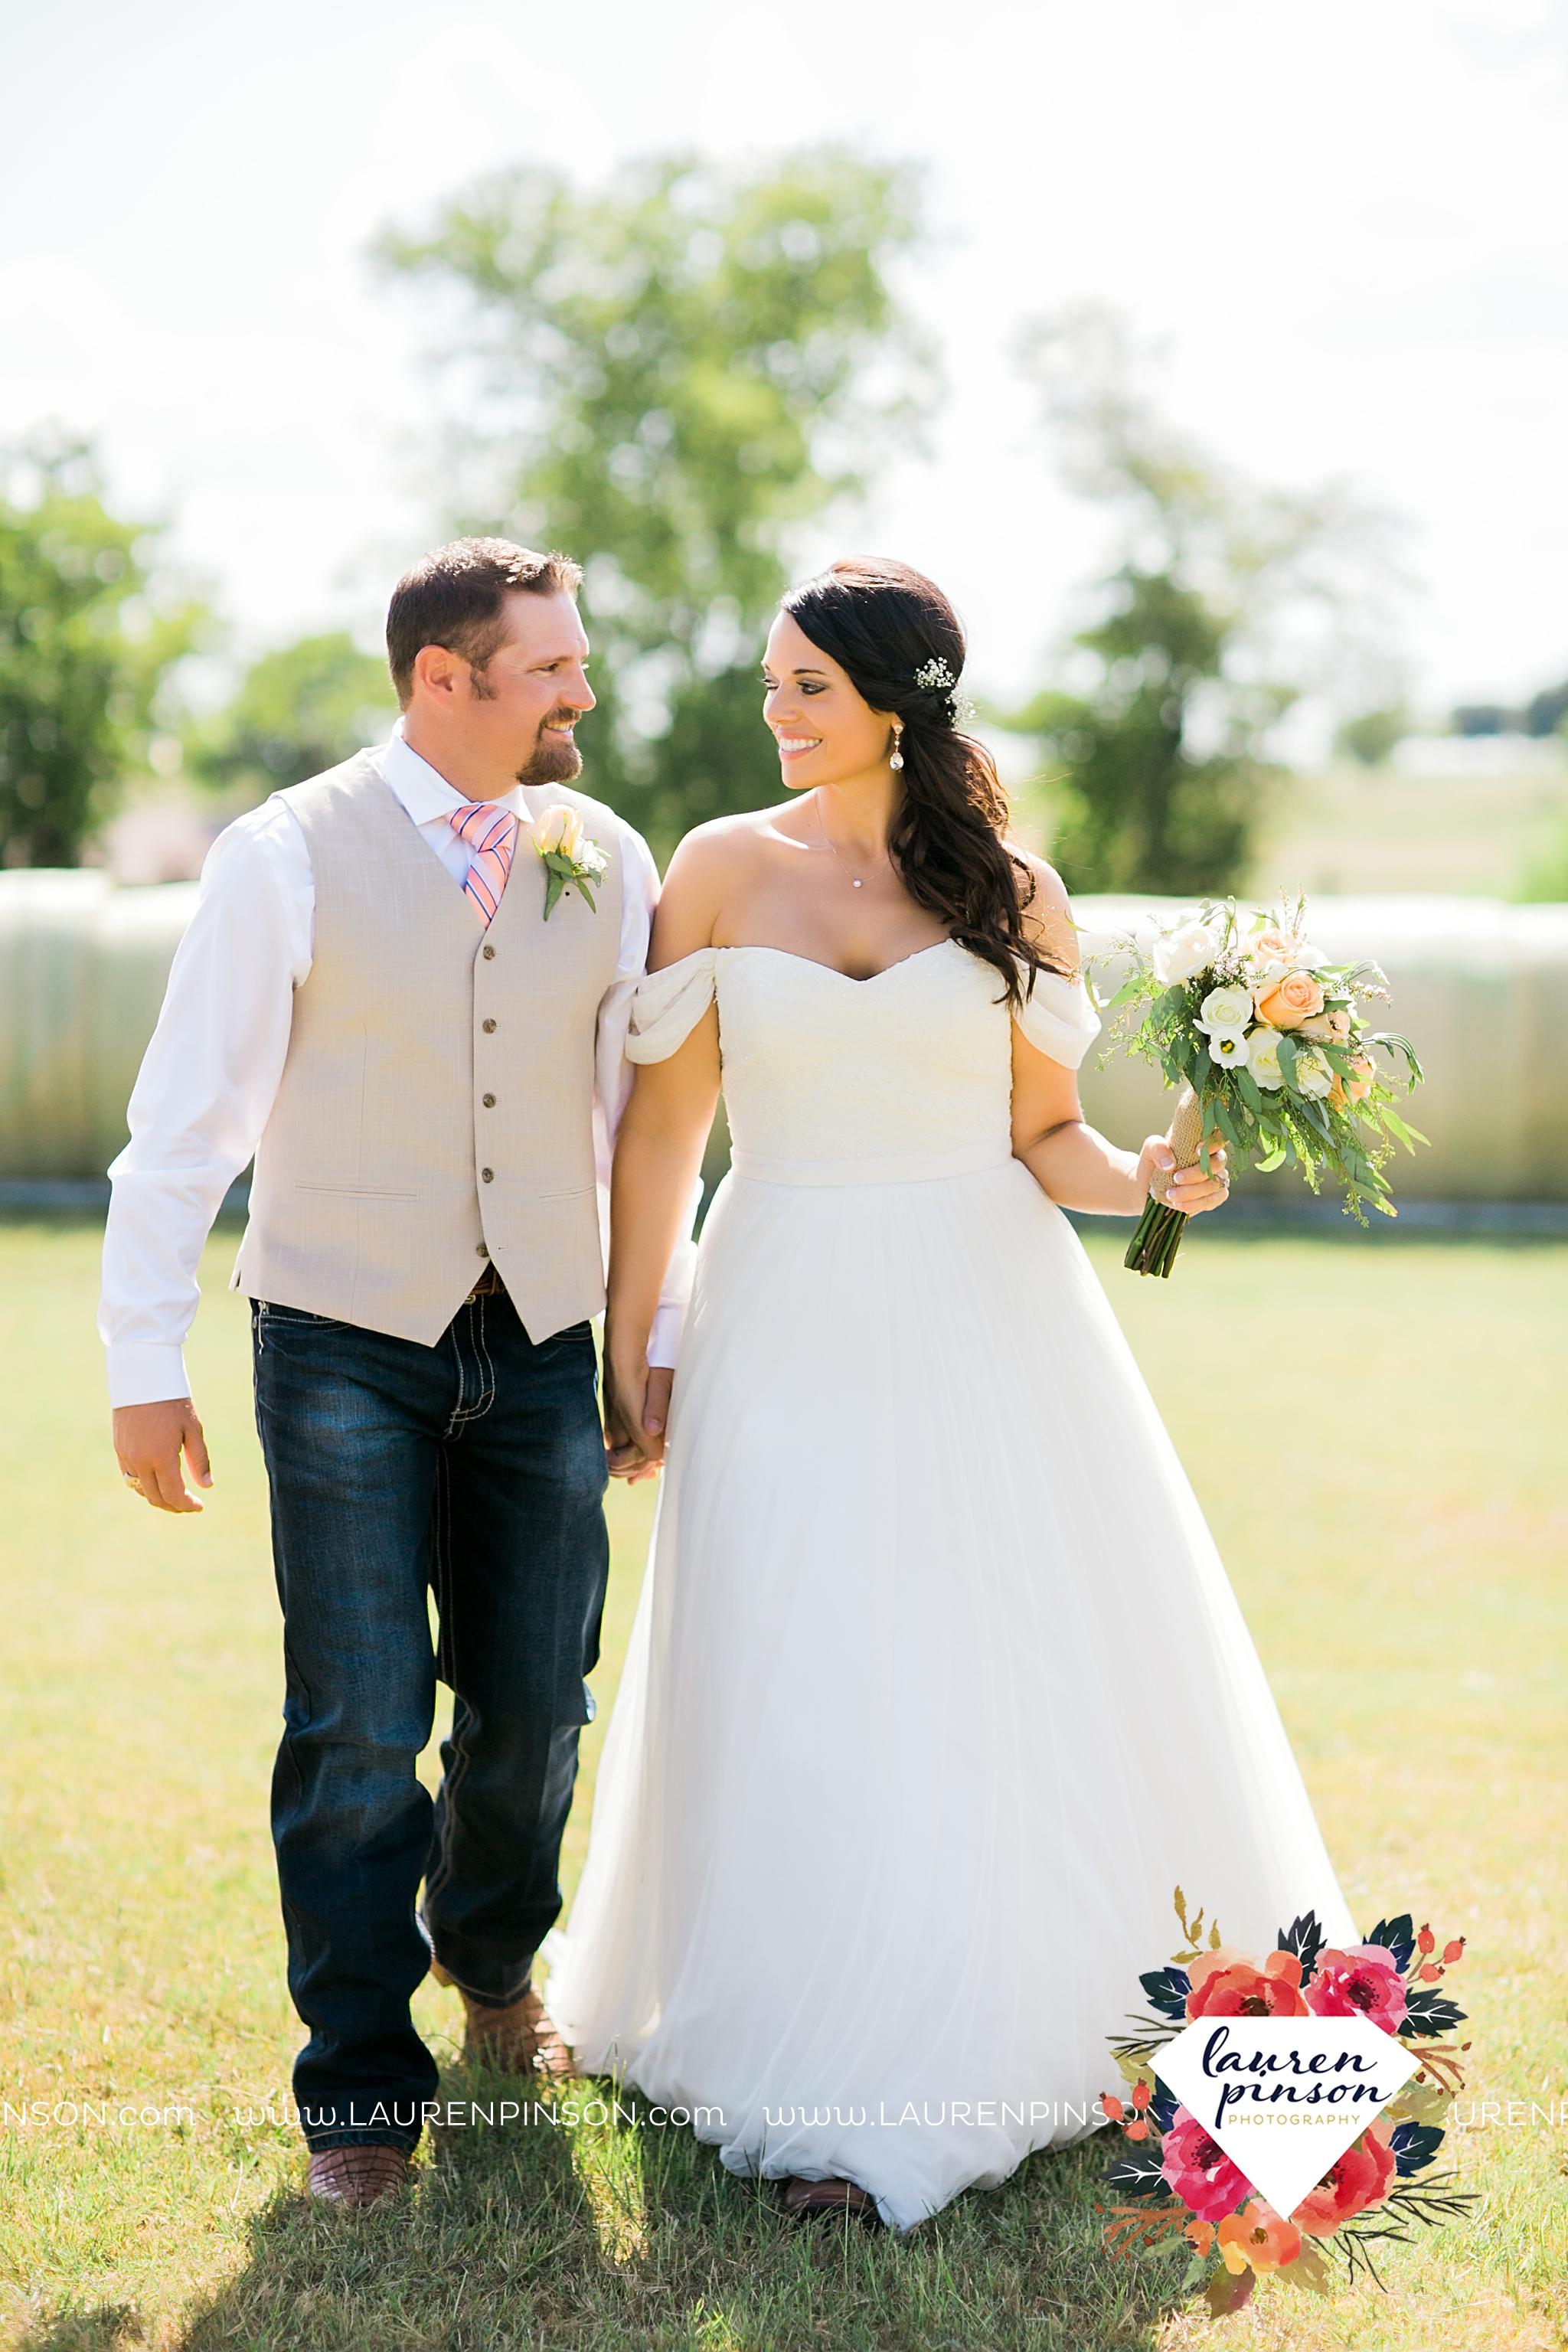 jones-barn-willow-creek-ranch-wedding-in-cleburne-texas-fort-worth-dfw-wichita-falls-wedding-photography_3225.jpg